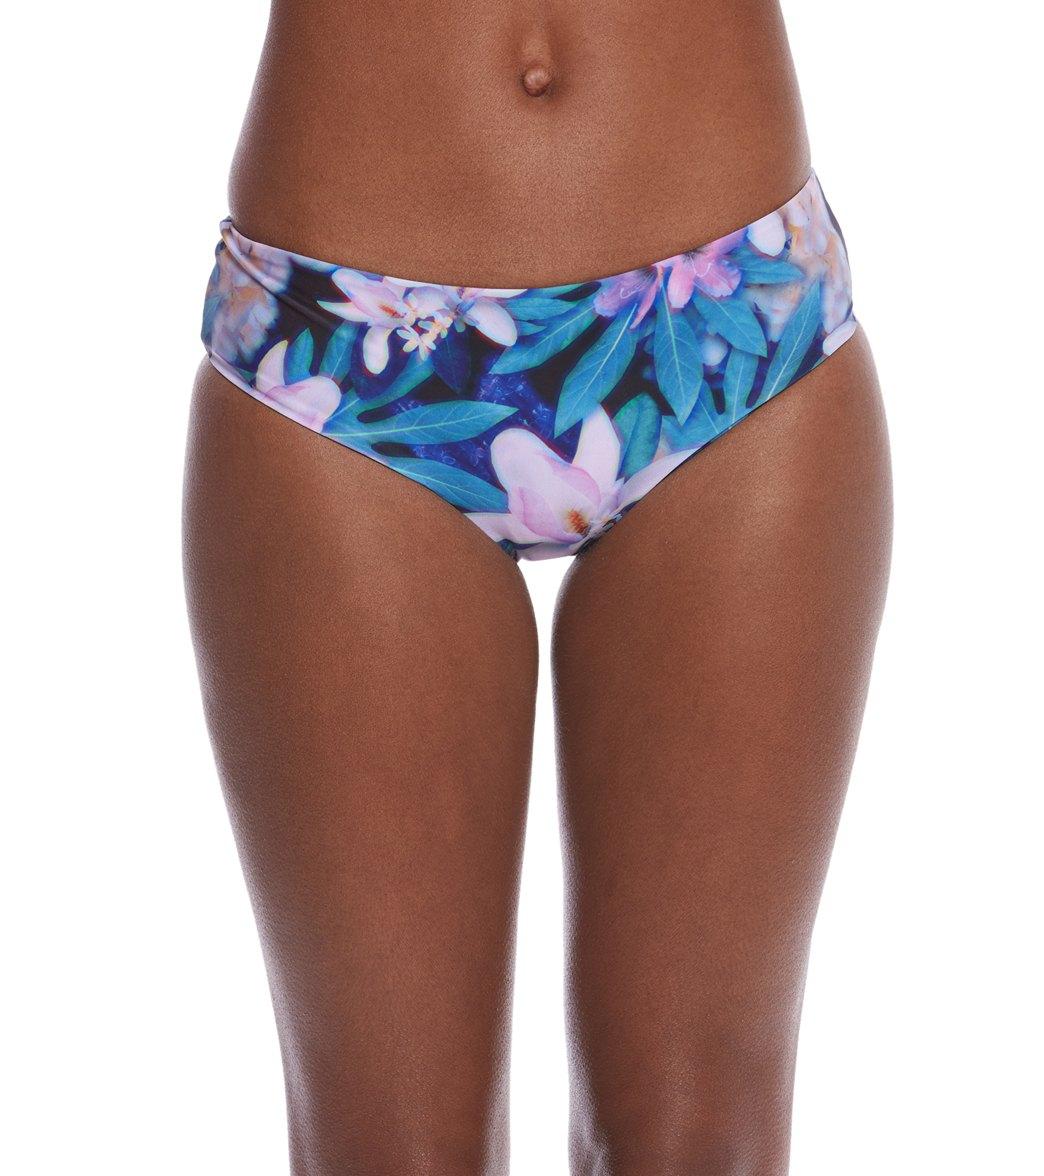 297b86d9c47f7 Stone Fox Swim Wonderland Milo Bikini Bottom at SwimOutlet.com - Free  Shipping